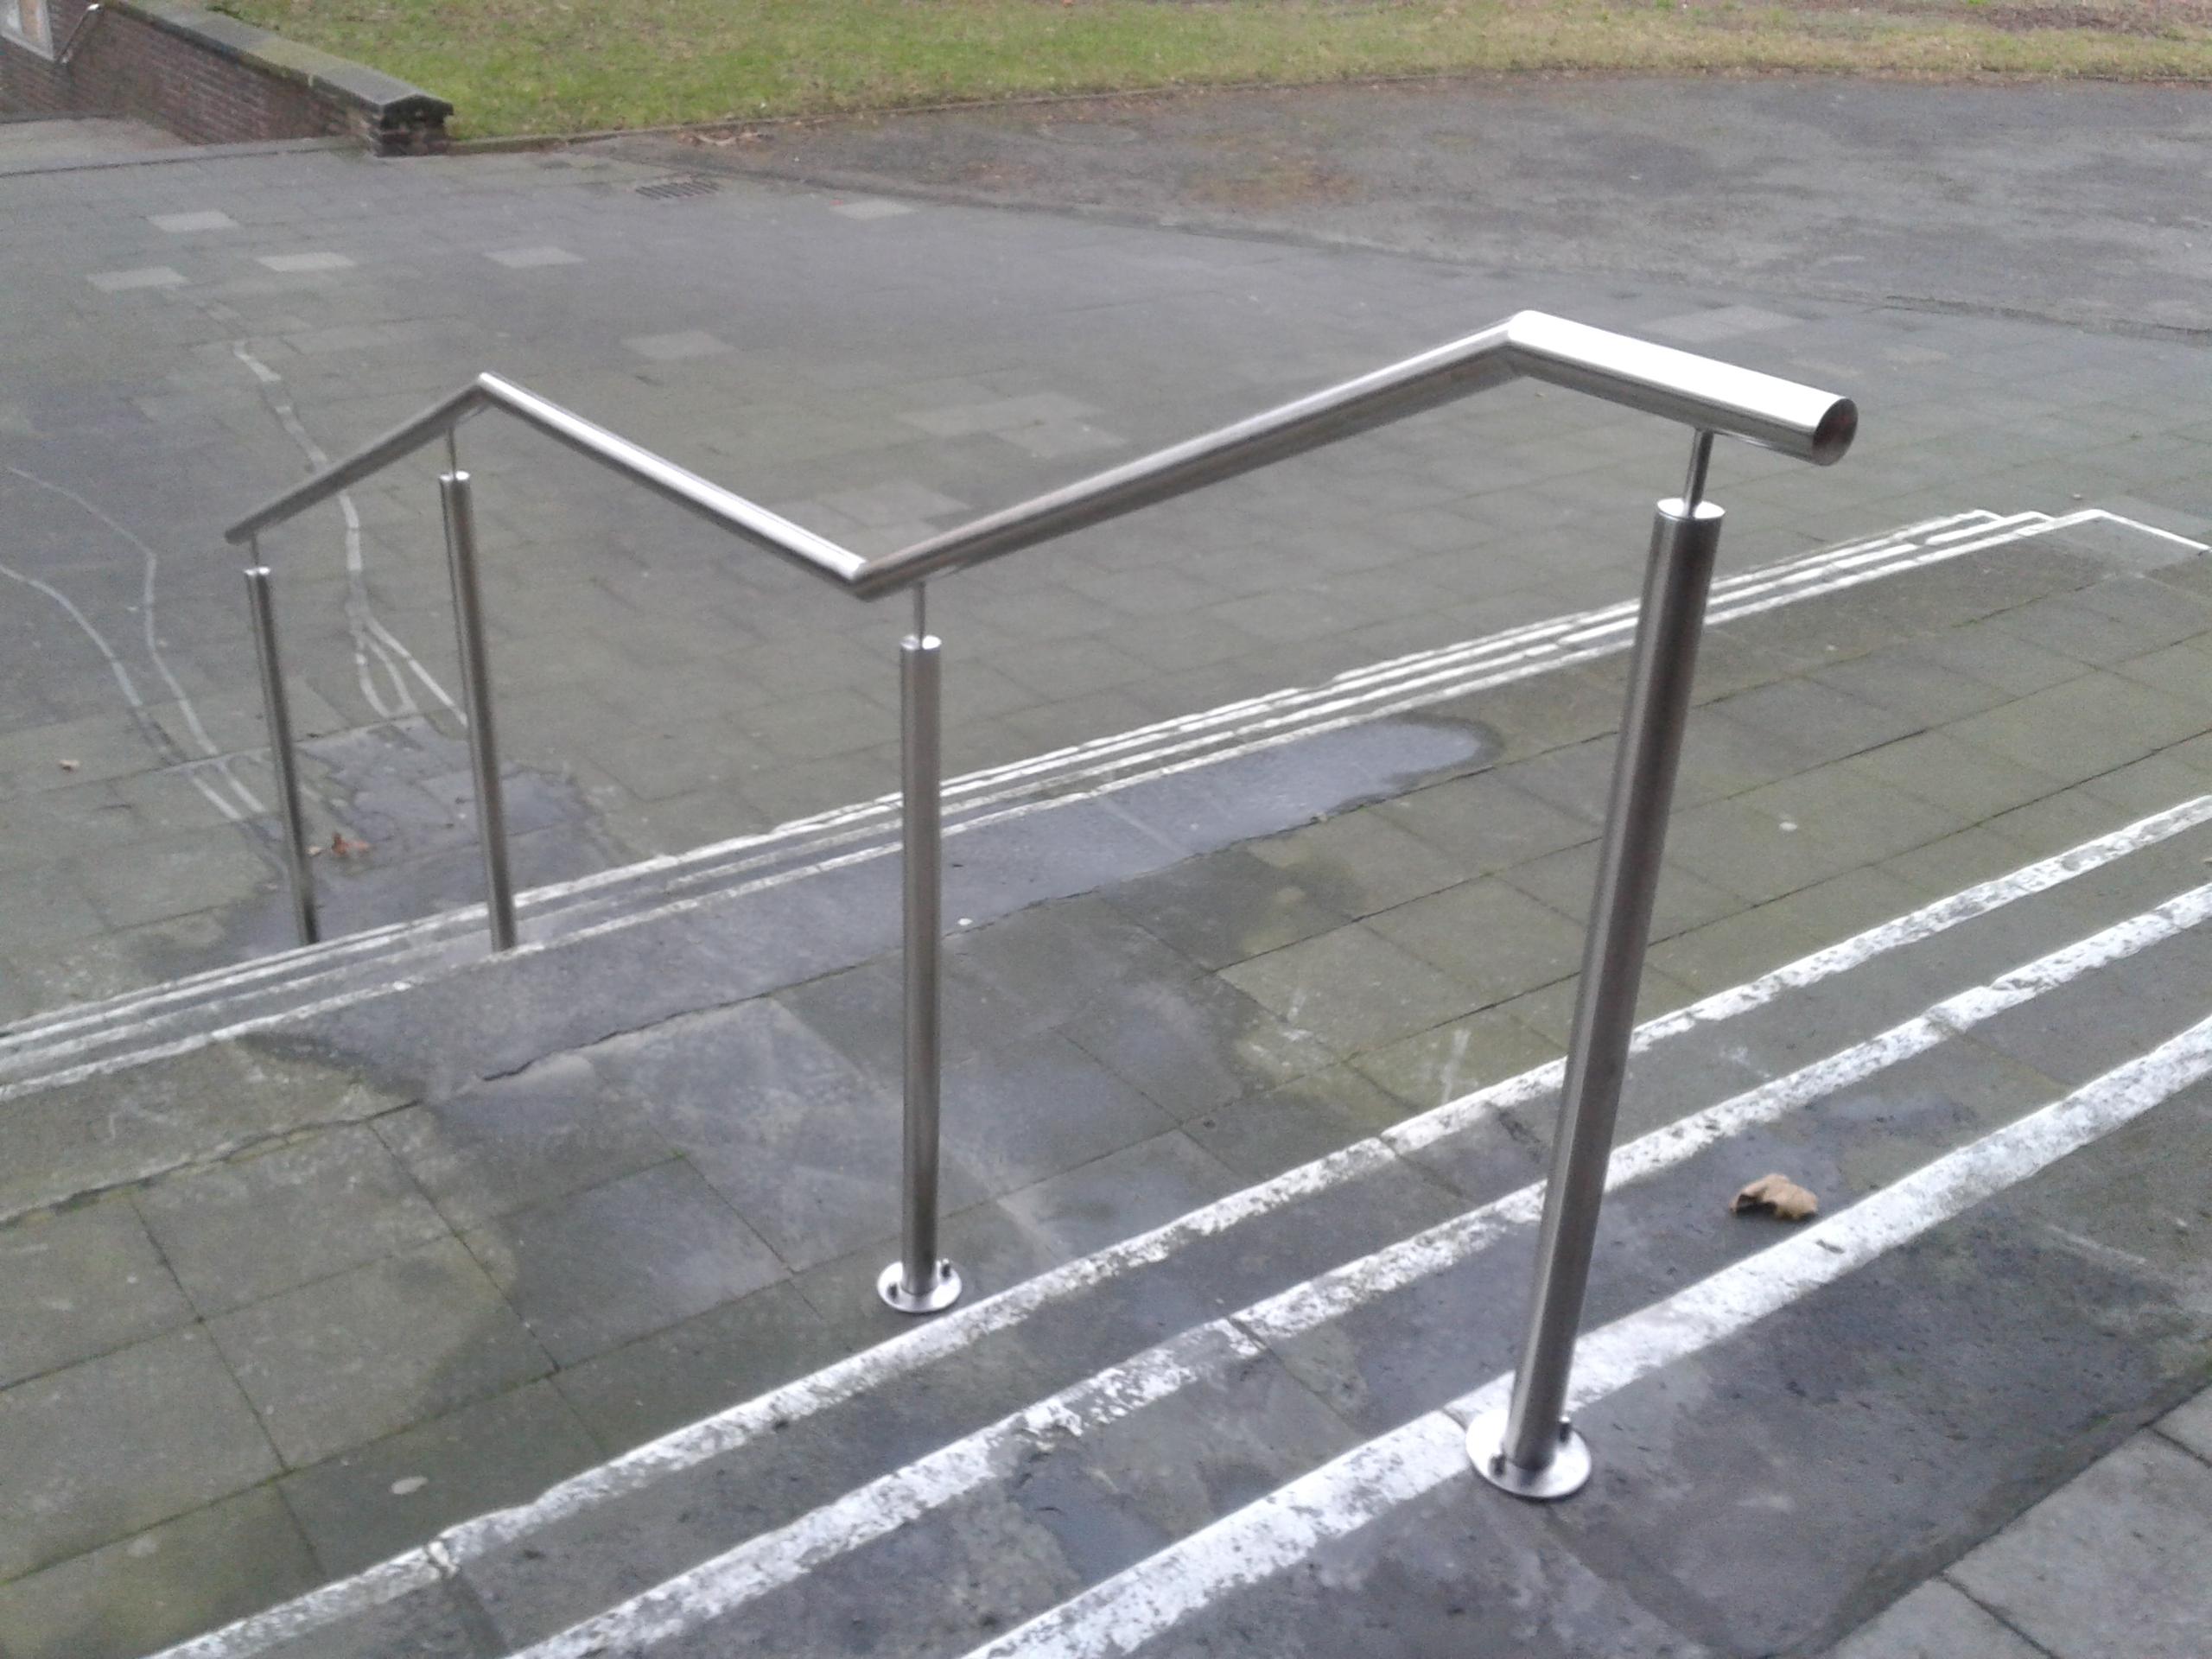 Edelstahl-Handlauf über mehrere Treppen-Podeste